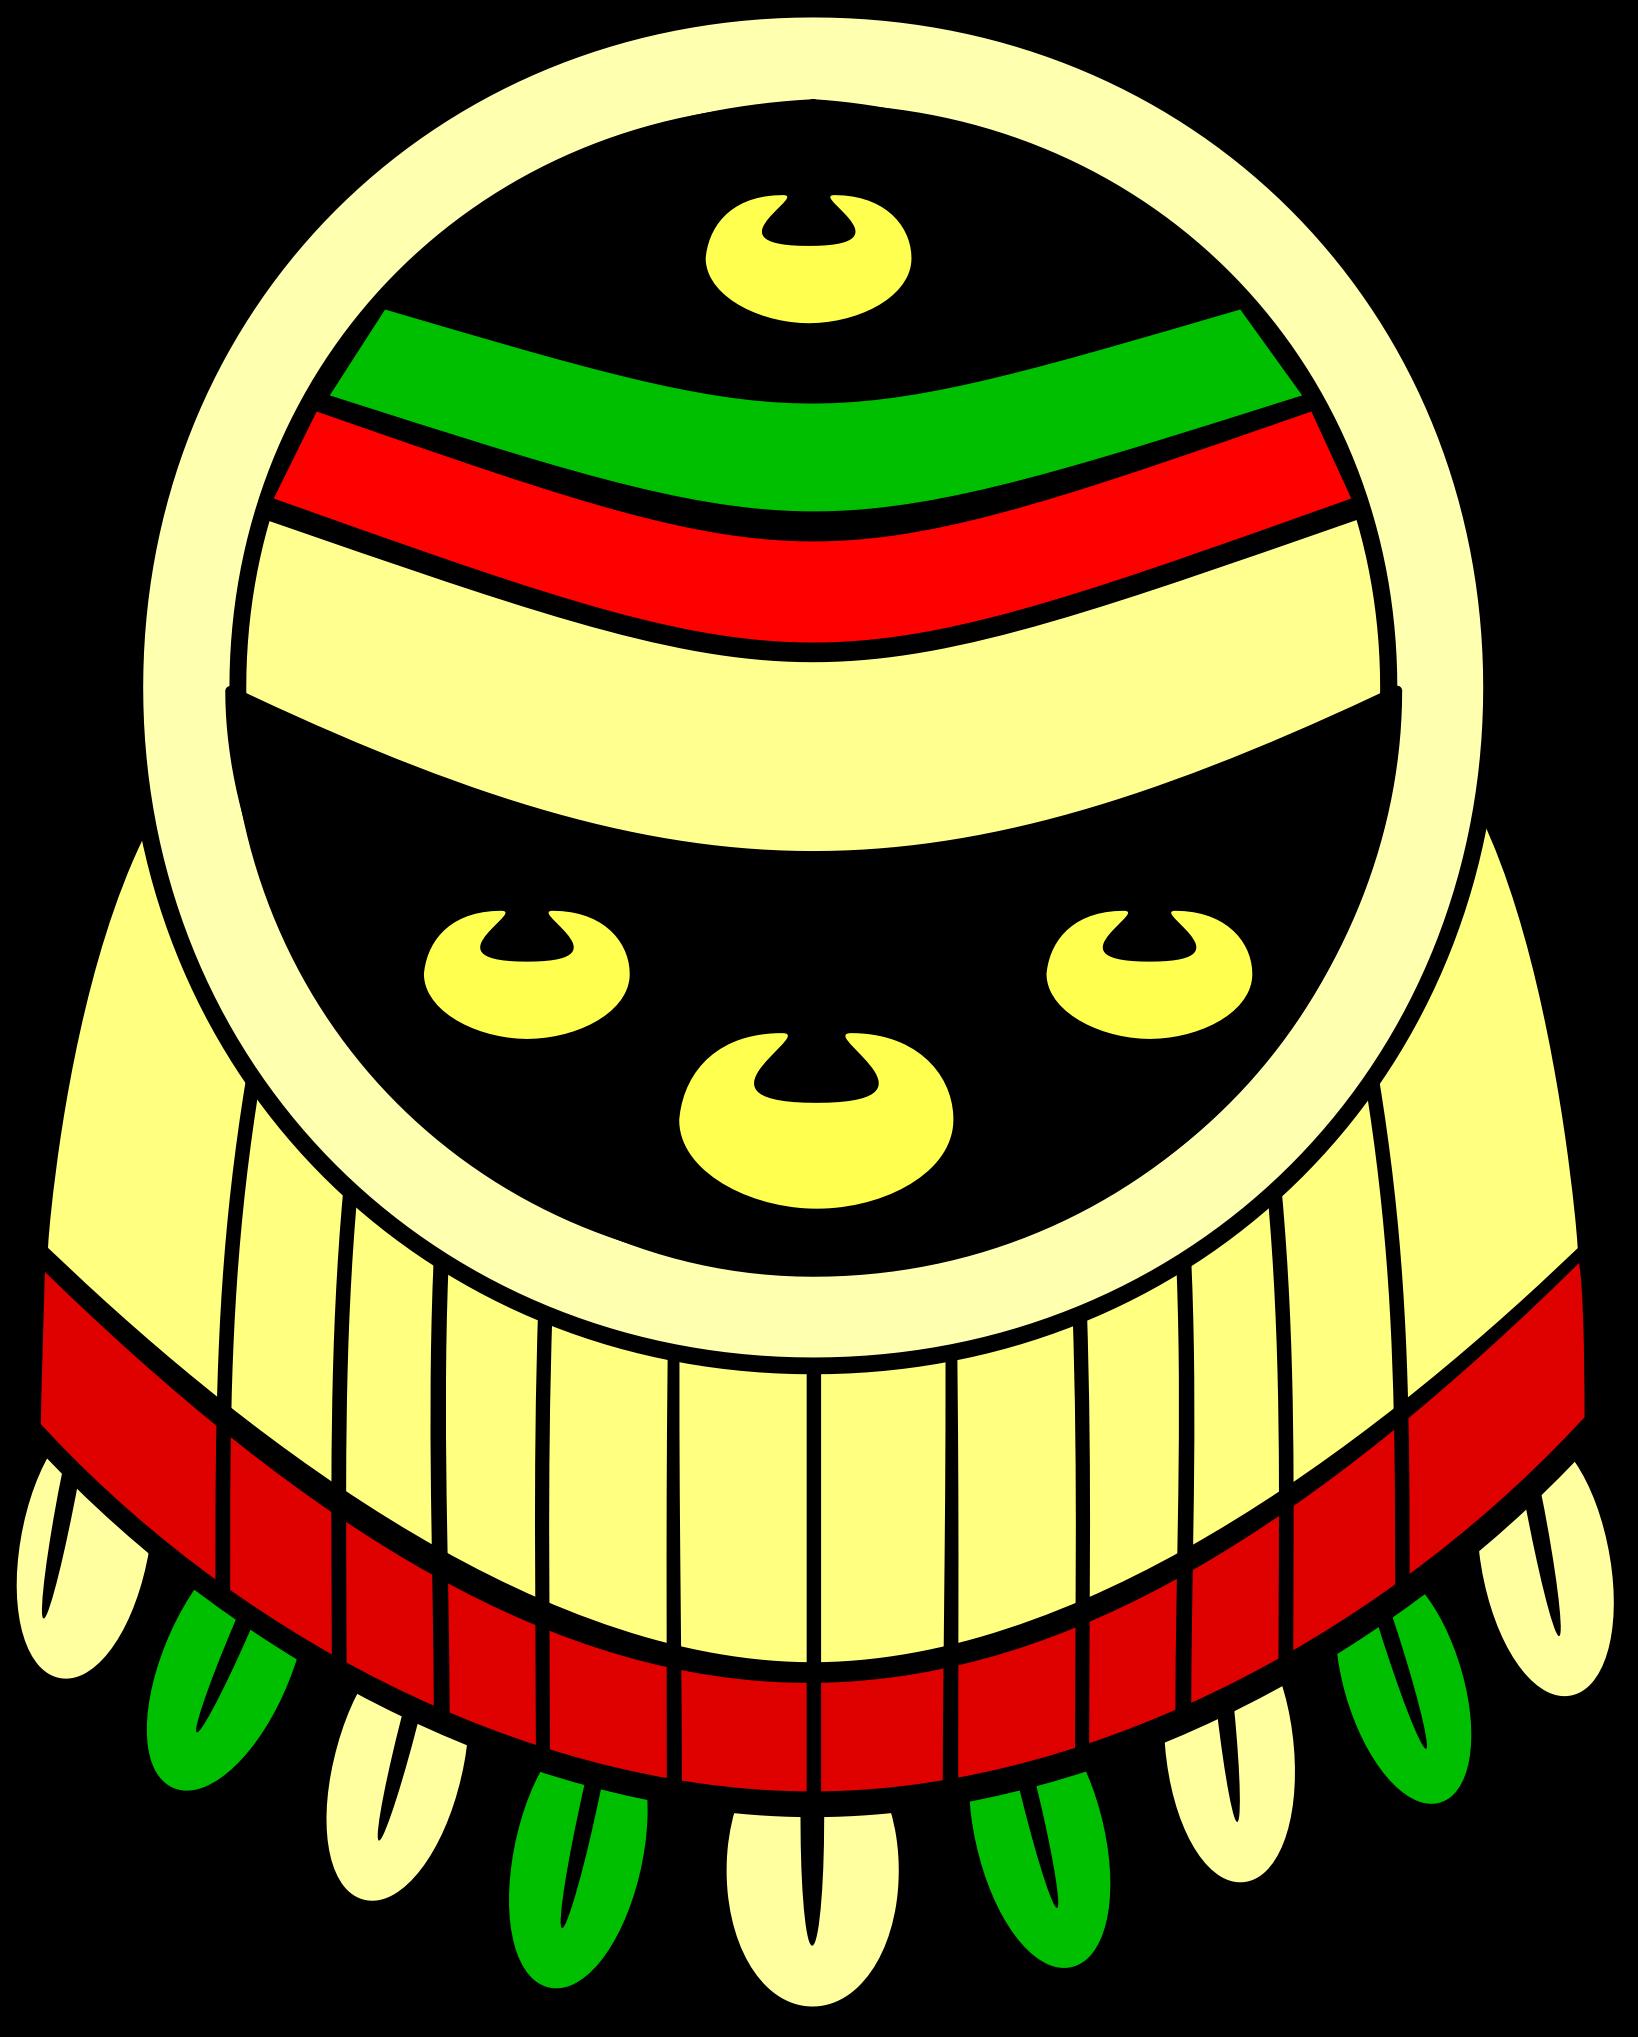 1638x2037 Aztec Clipart Transparent